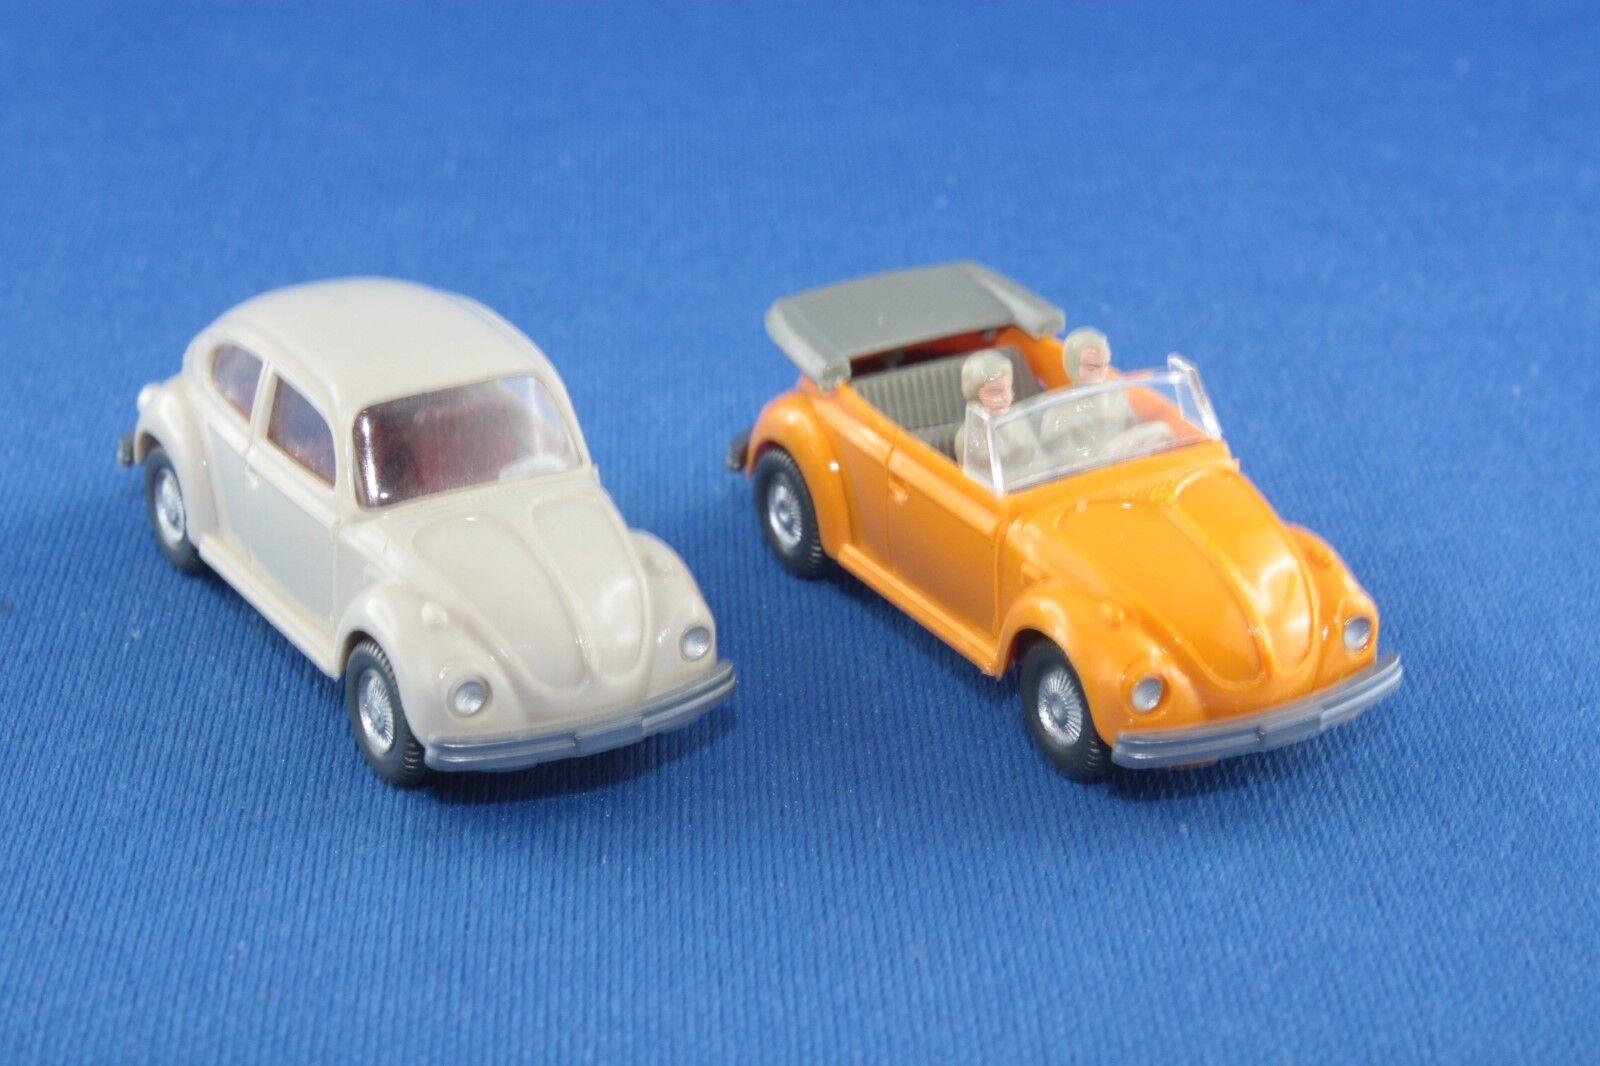 2er-set Wiking VW Beetle + Coccinelle cabriolet 1 87 1 90 h0 O. neuf dans sa boîte COLLECTION résolution